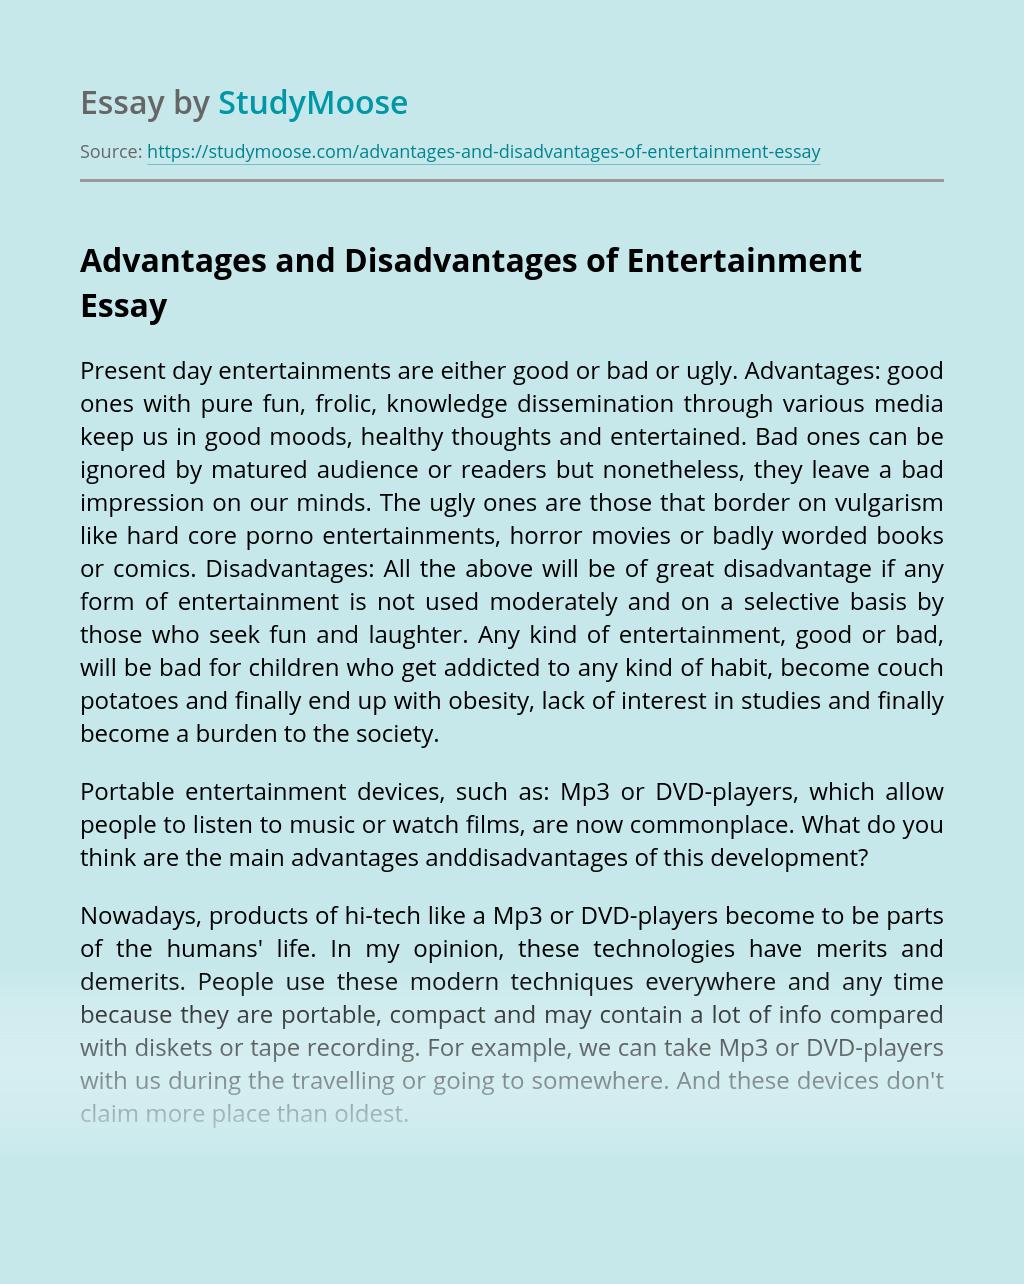 Advantages and Disadvantages of Entertainment